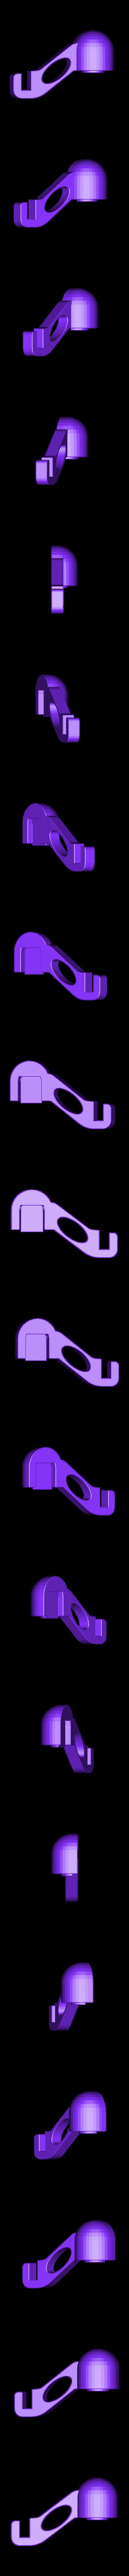 repaired_right-spool-holder-1.stl Download free STL file Quick change filament holder • 3D print design, TheJimReaper